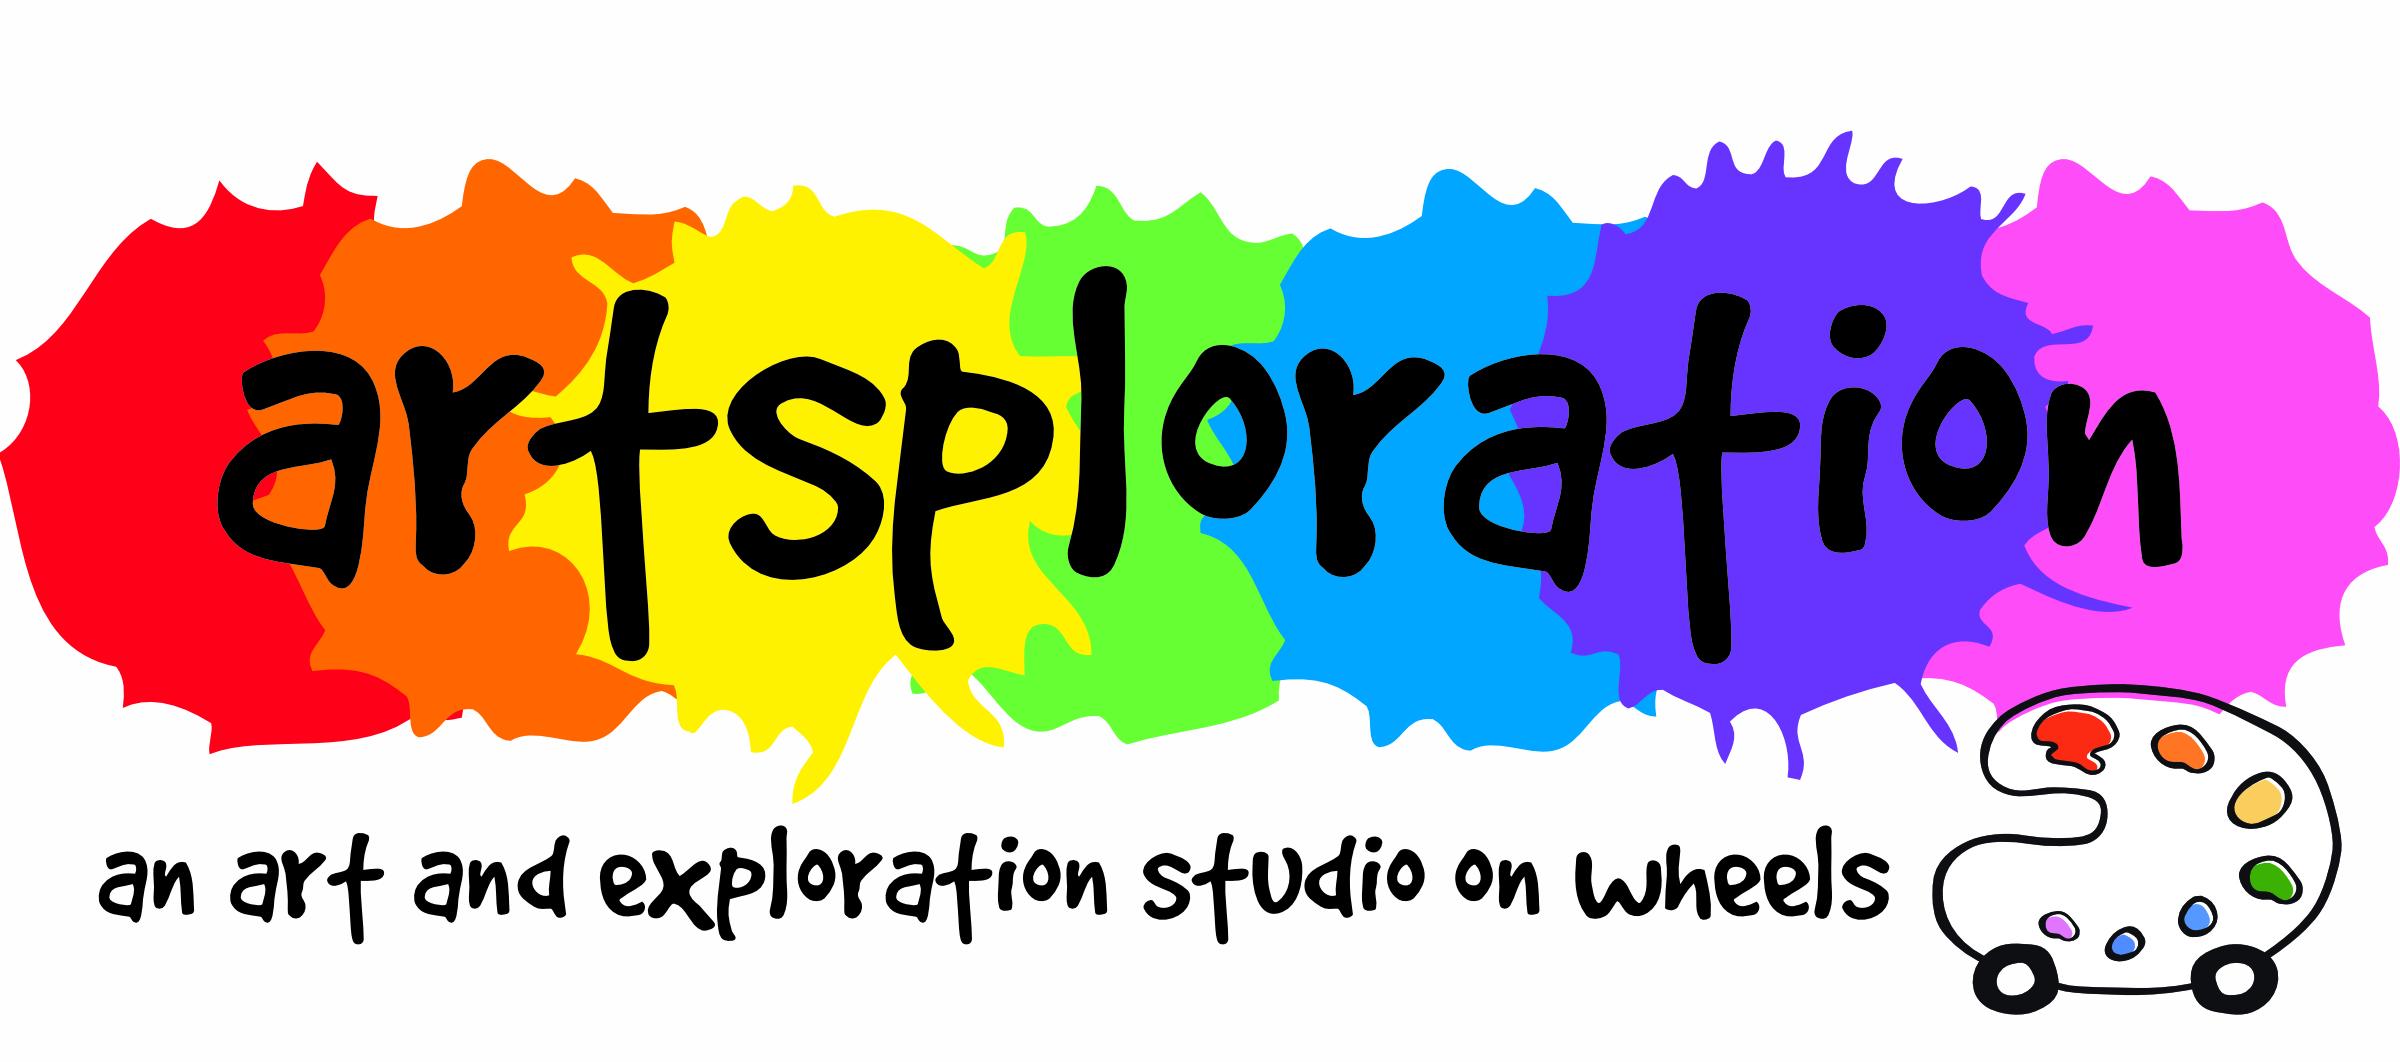 Artsploration